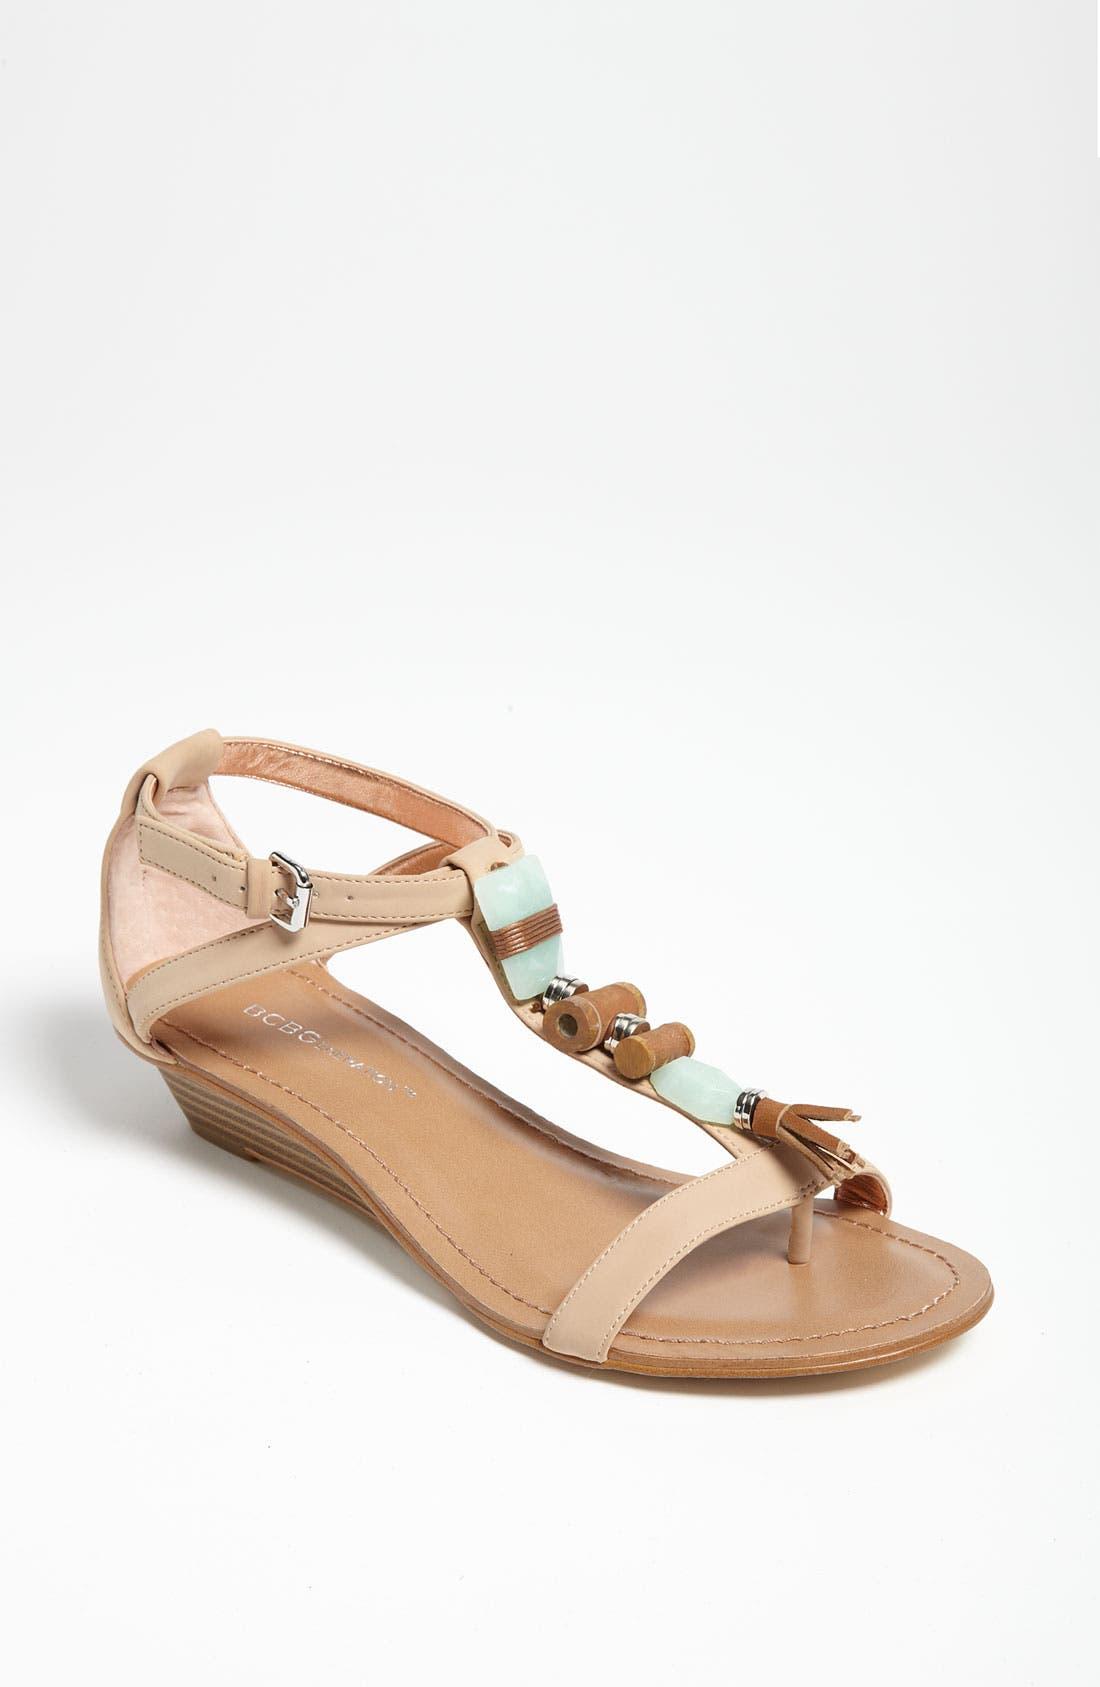 Main Image - BCBGeneration 'Tandee' Sandal